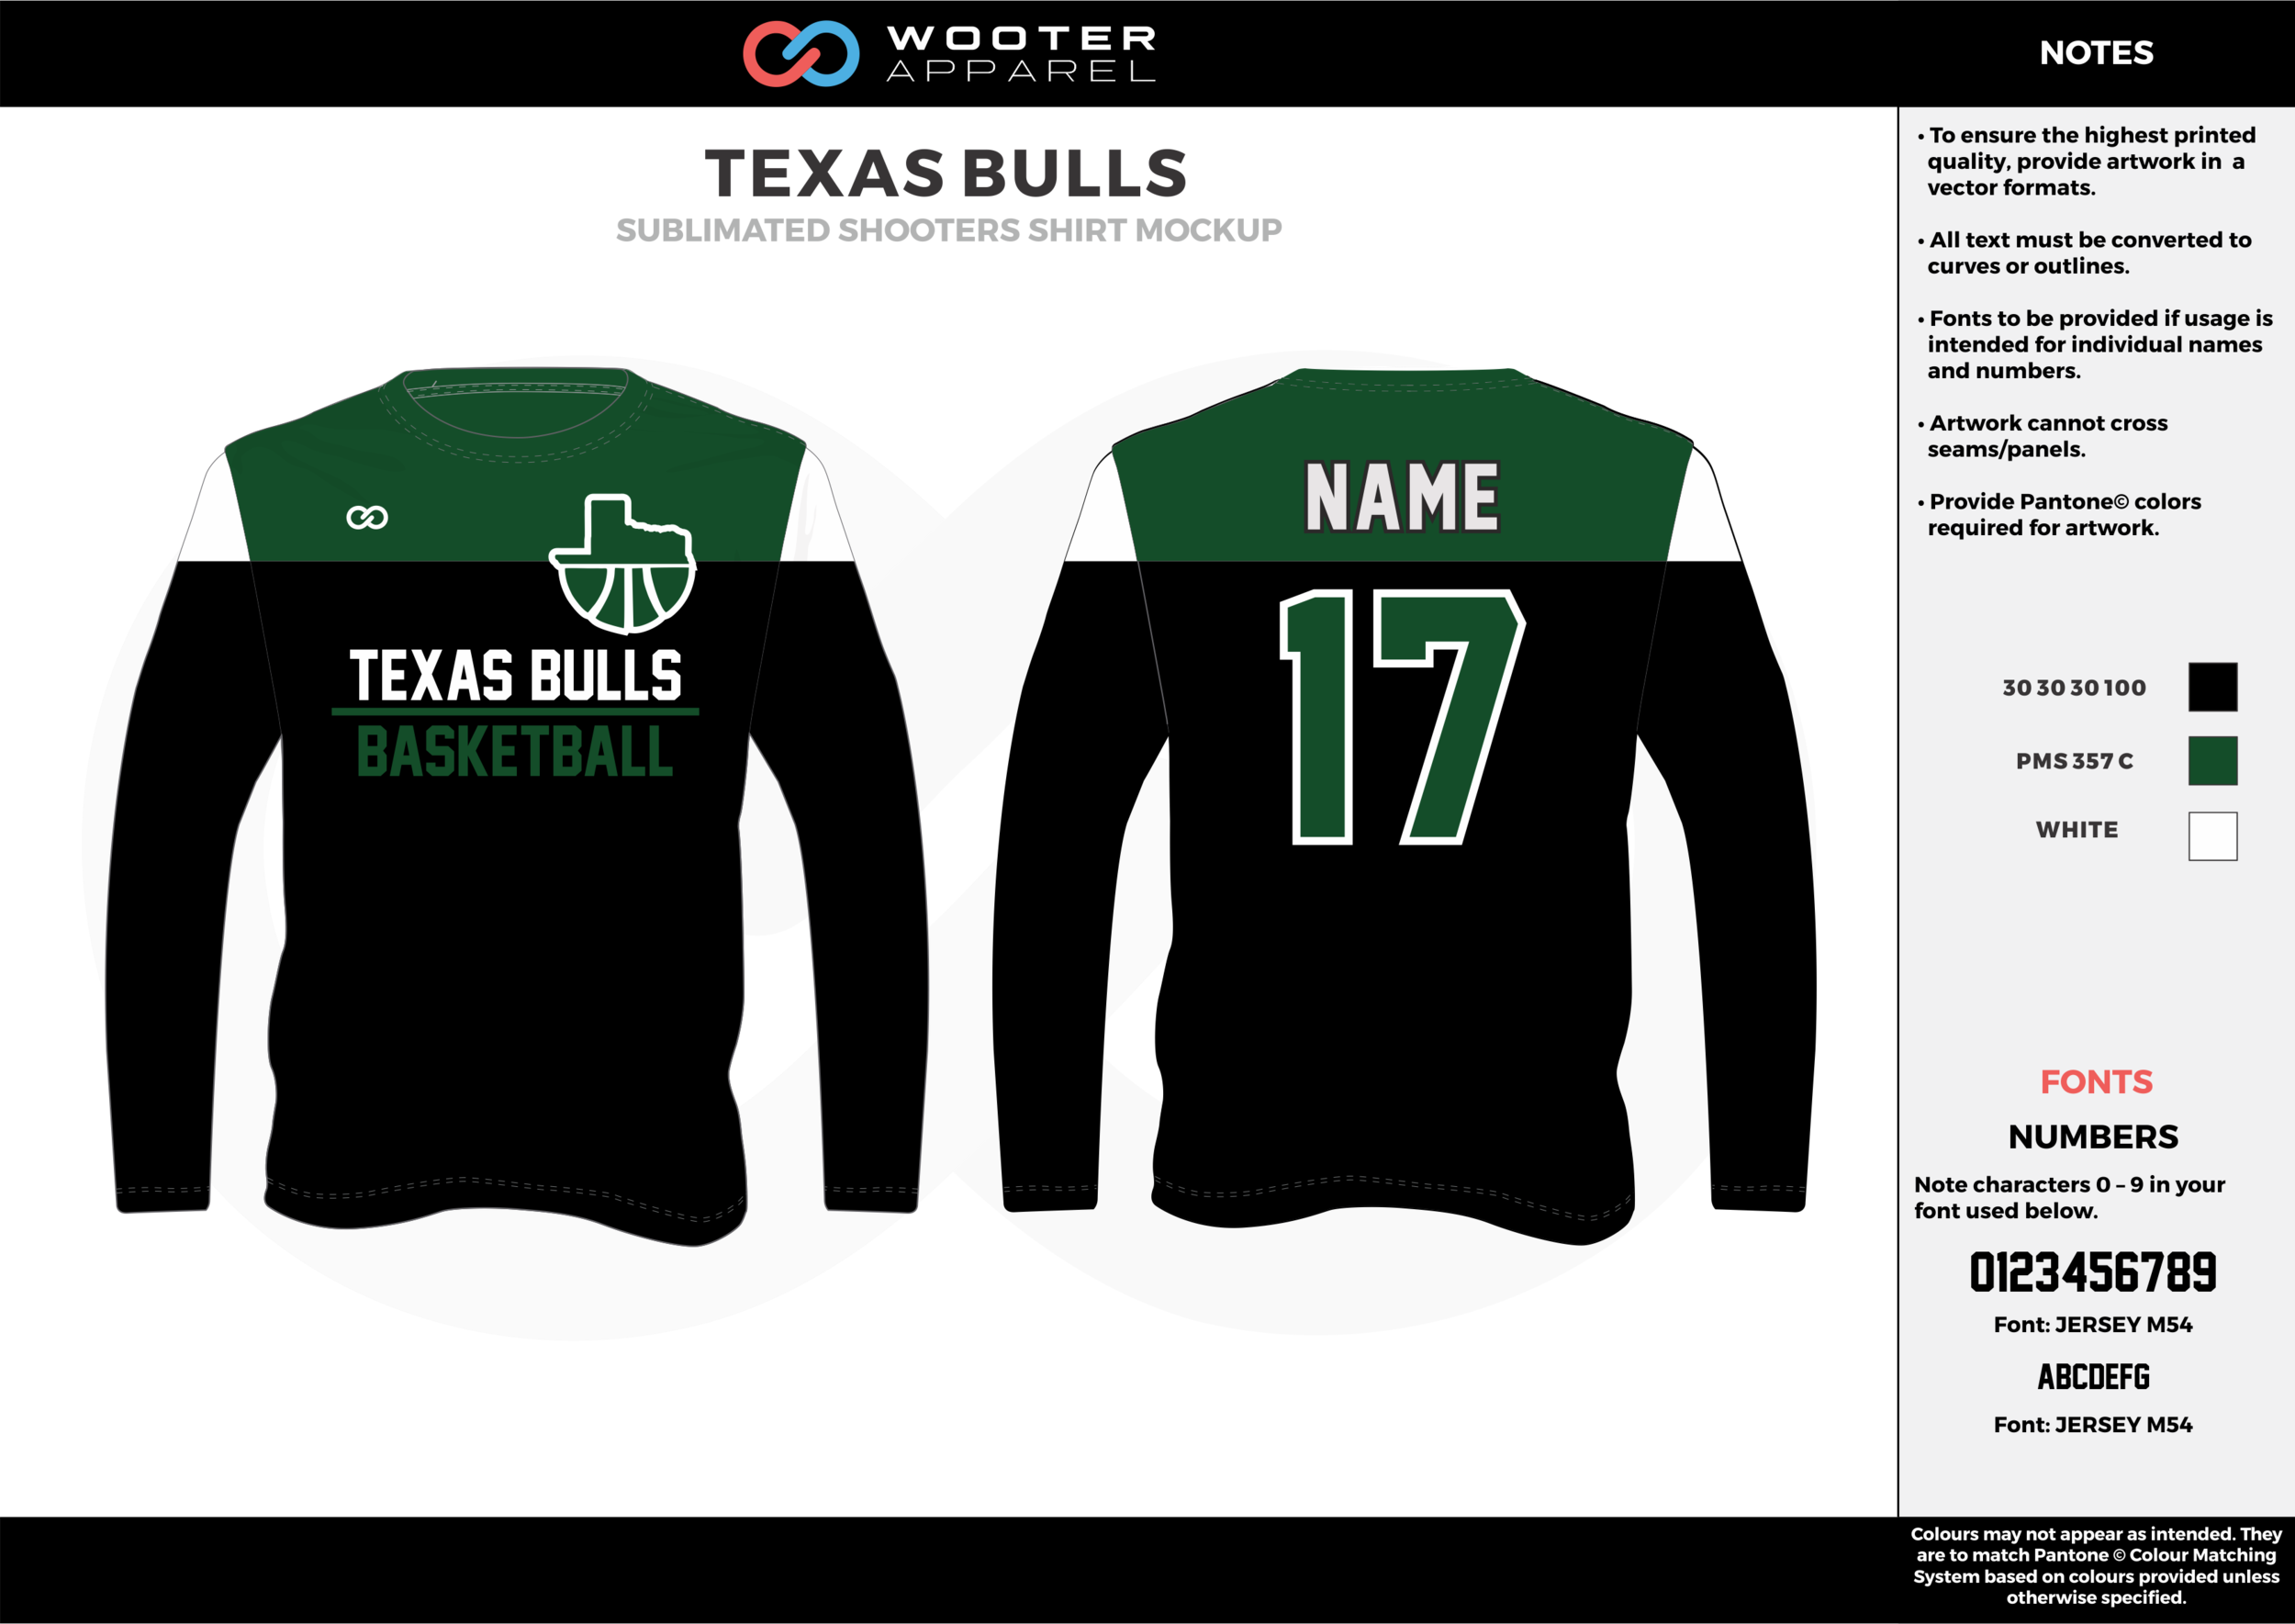 TEXAS BULLS black green white Basketball Long Sleeve Shooting Shirt